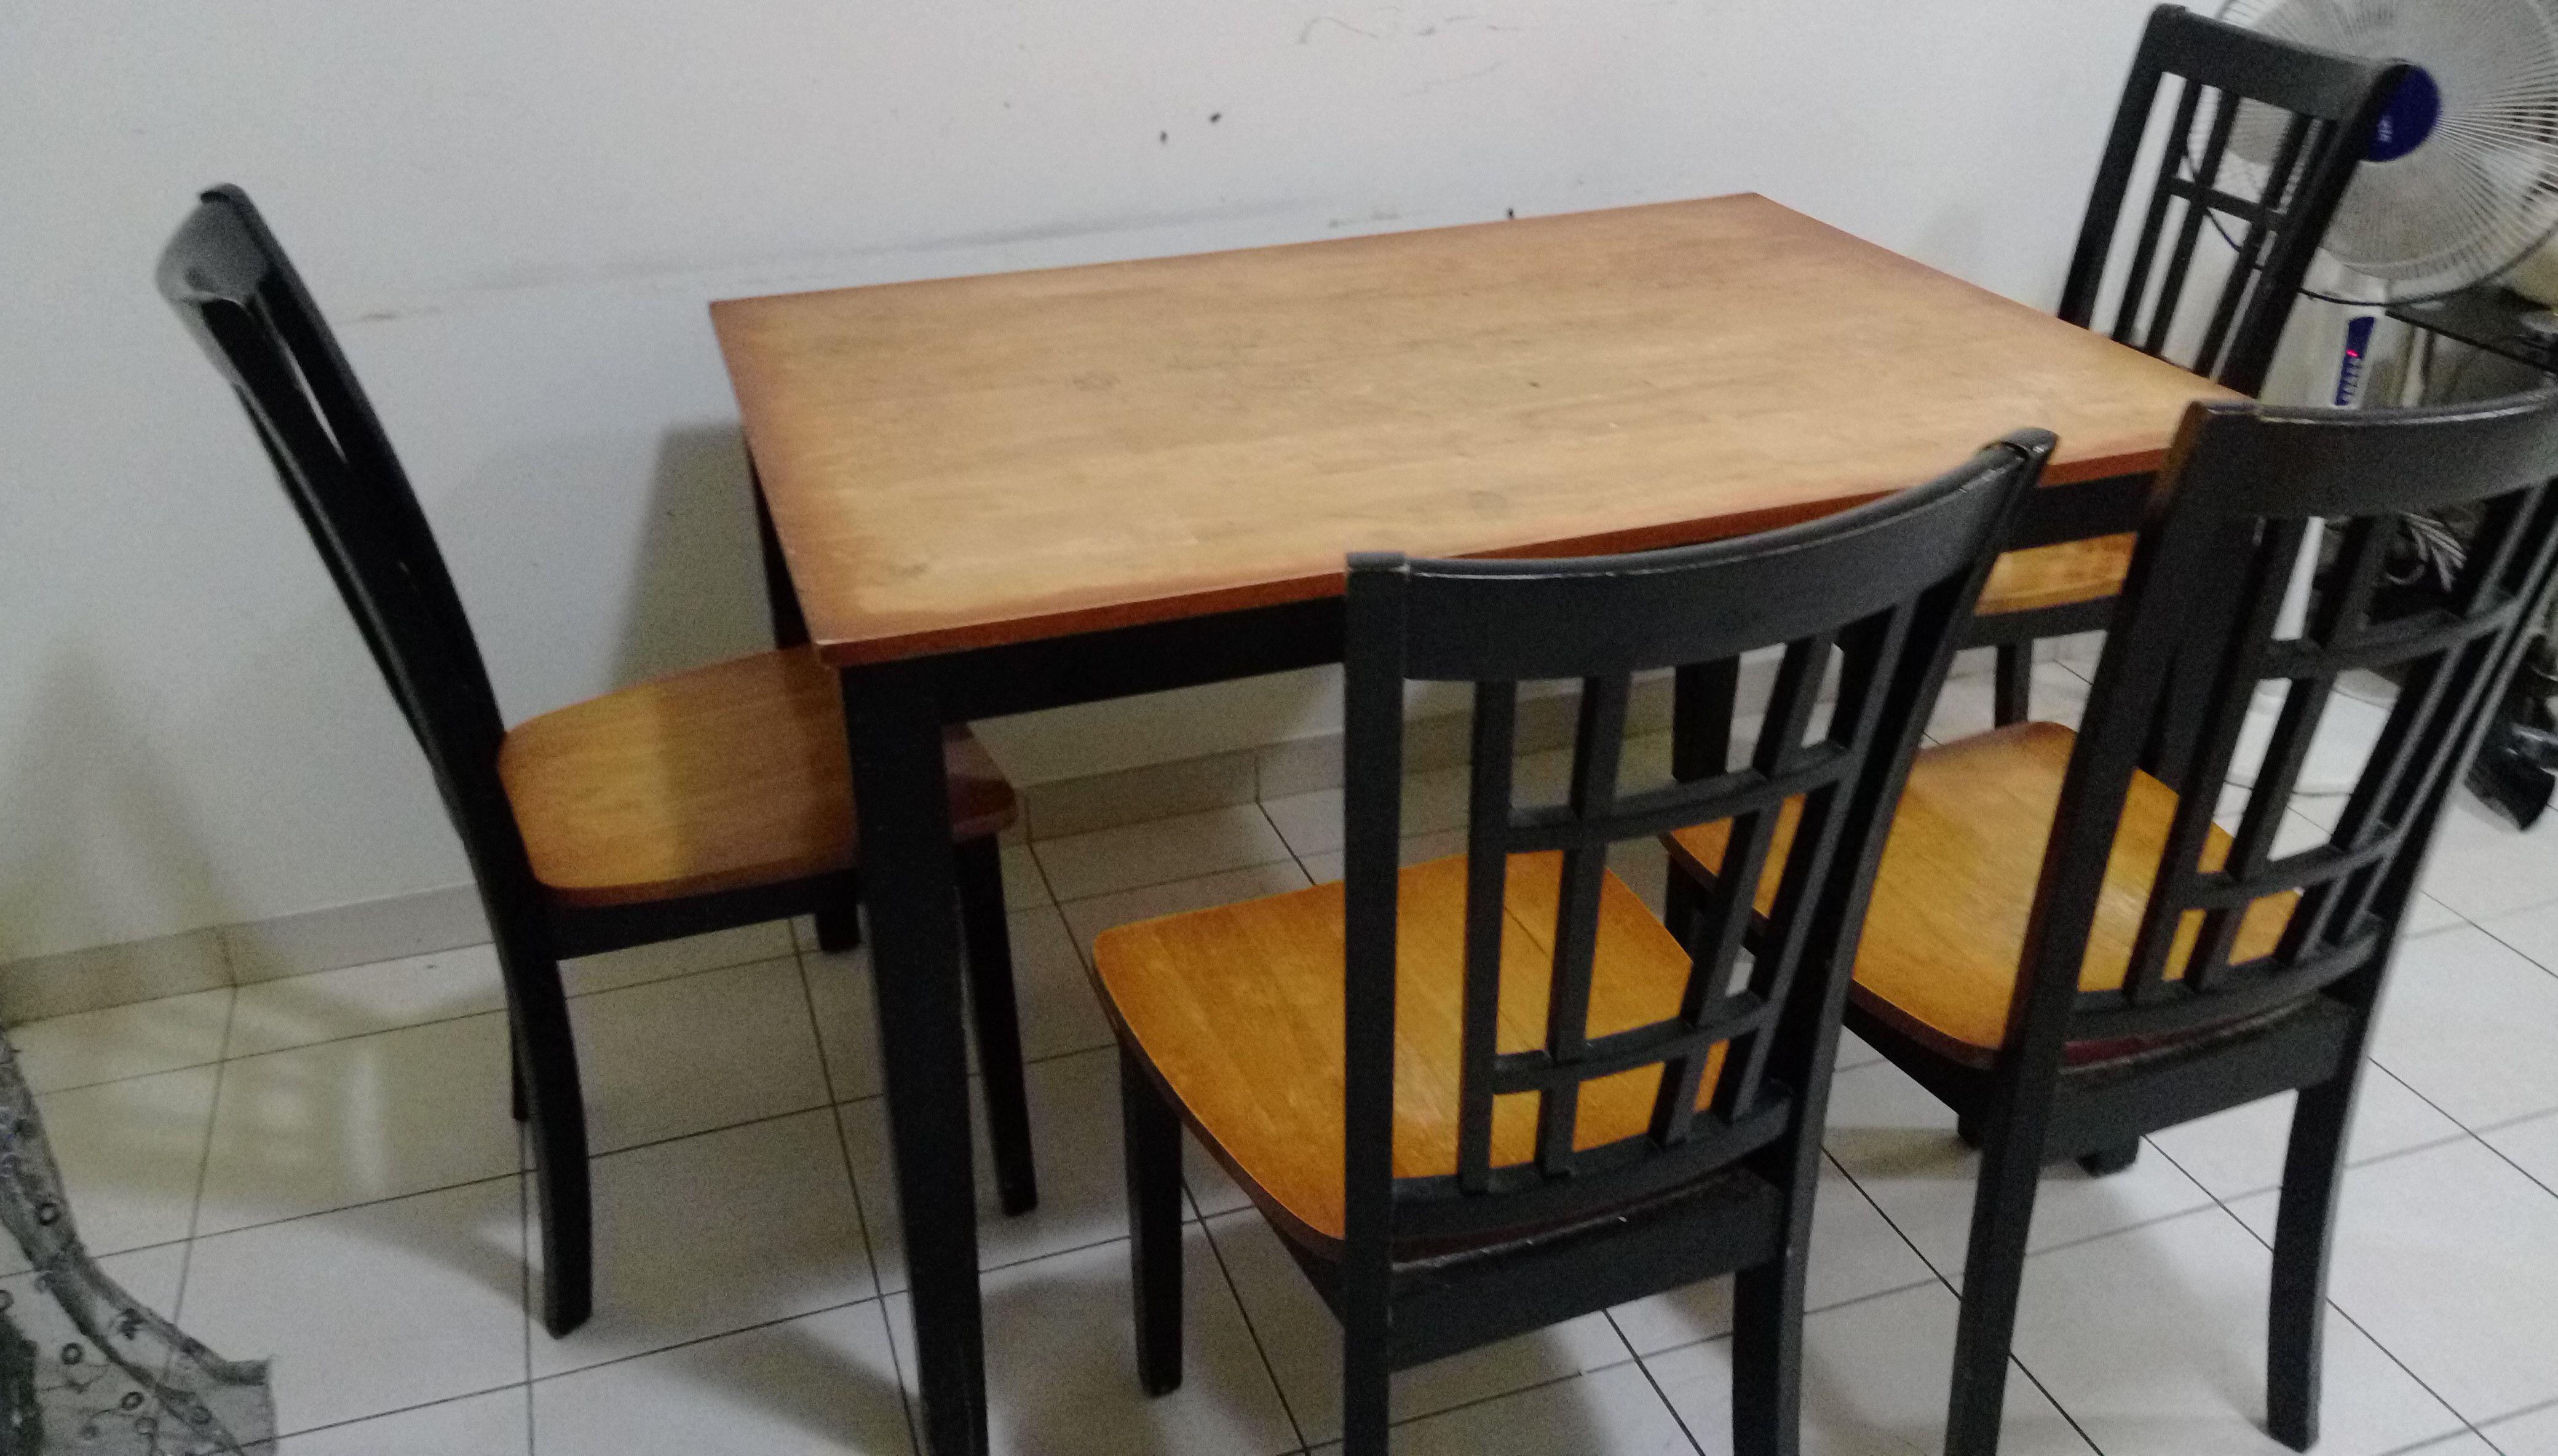 wooden dining table with four chairs Dubai UAE Storat : 58fda705cc4cb606811115original from dubai.storat.com size 4160 x 2368 jpeg 1101kB